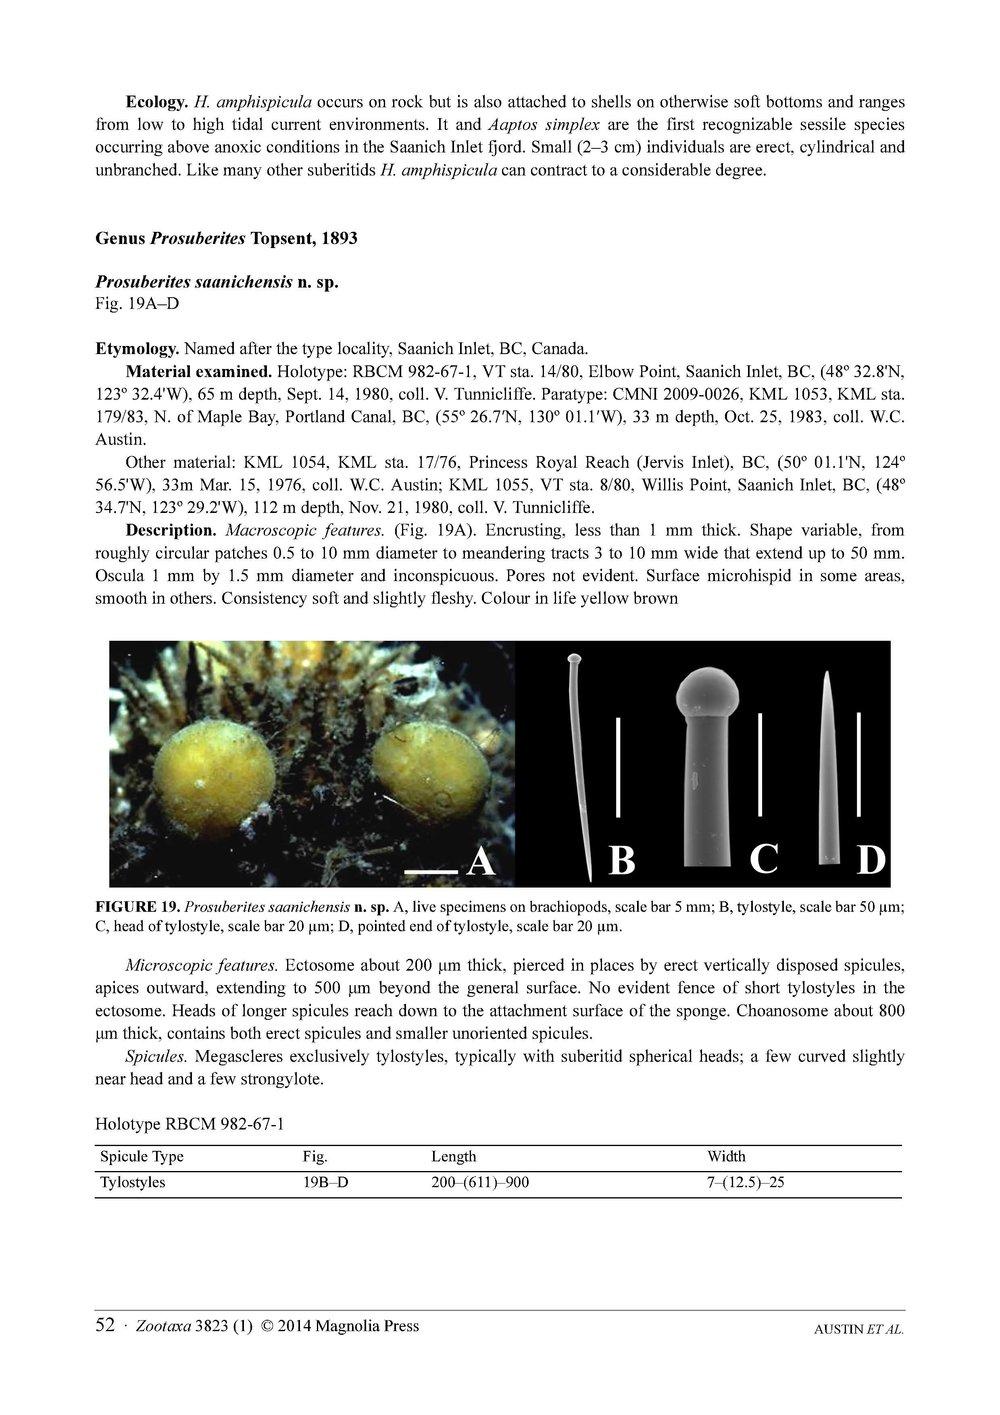 Austin et al 2014 NE Pacific Hadromerids_Page_52.jpg